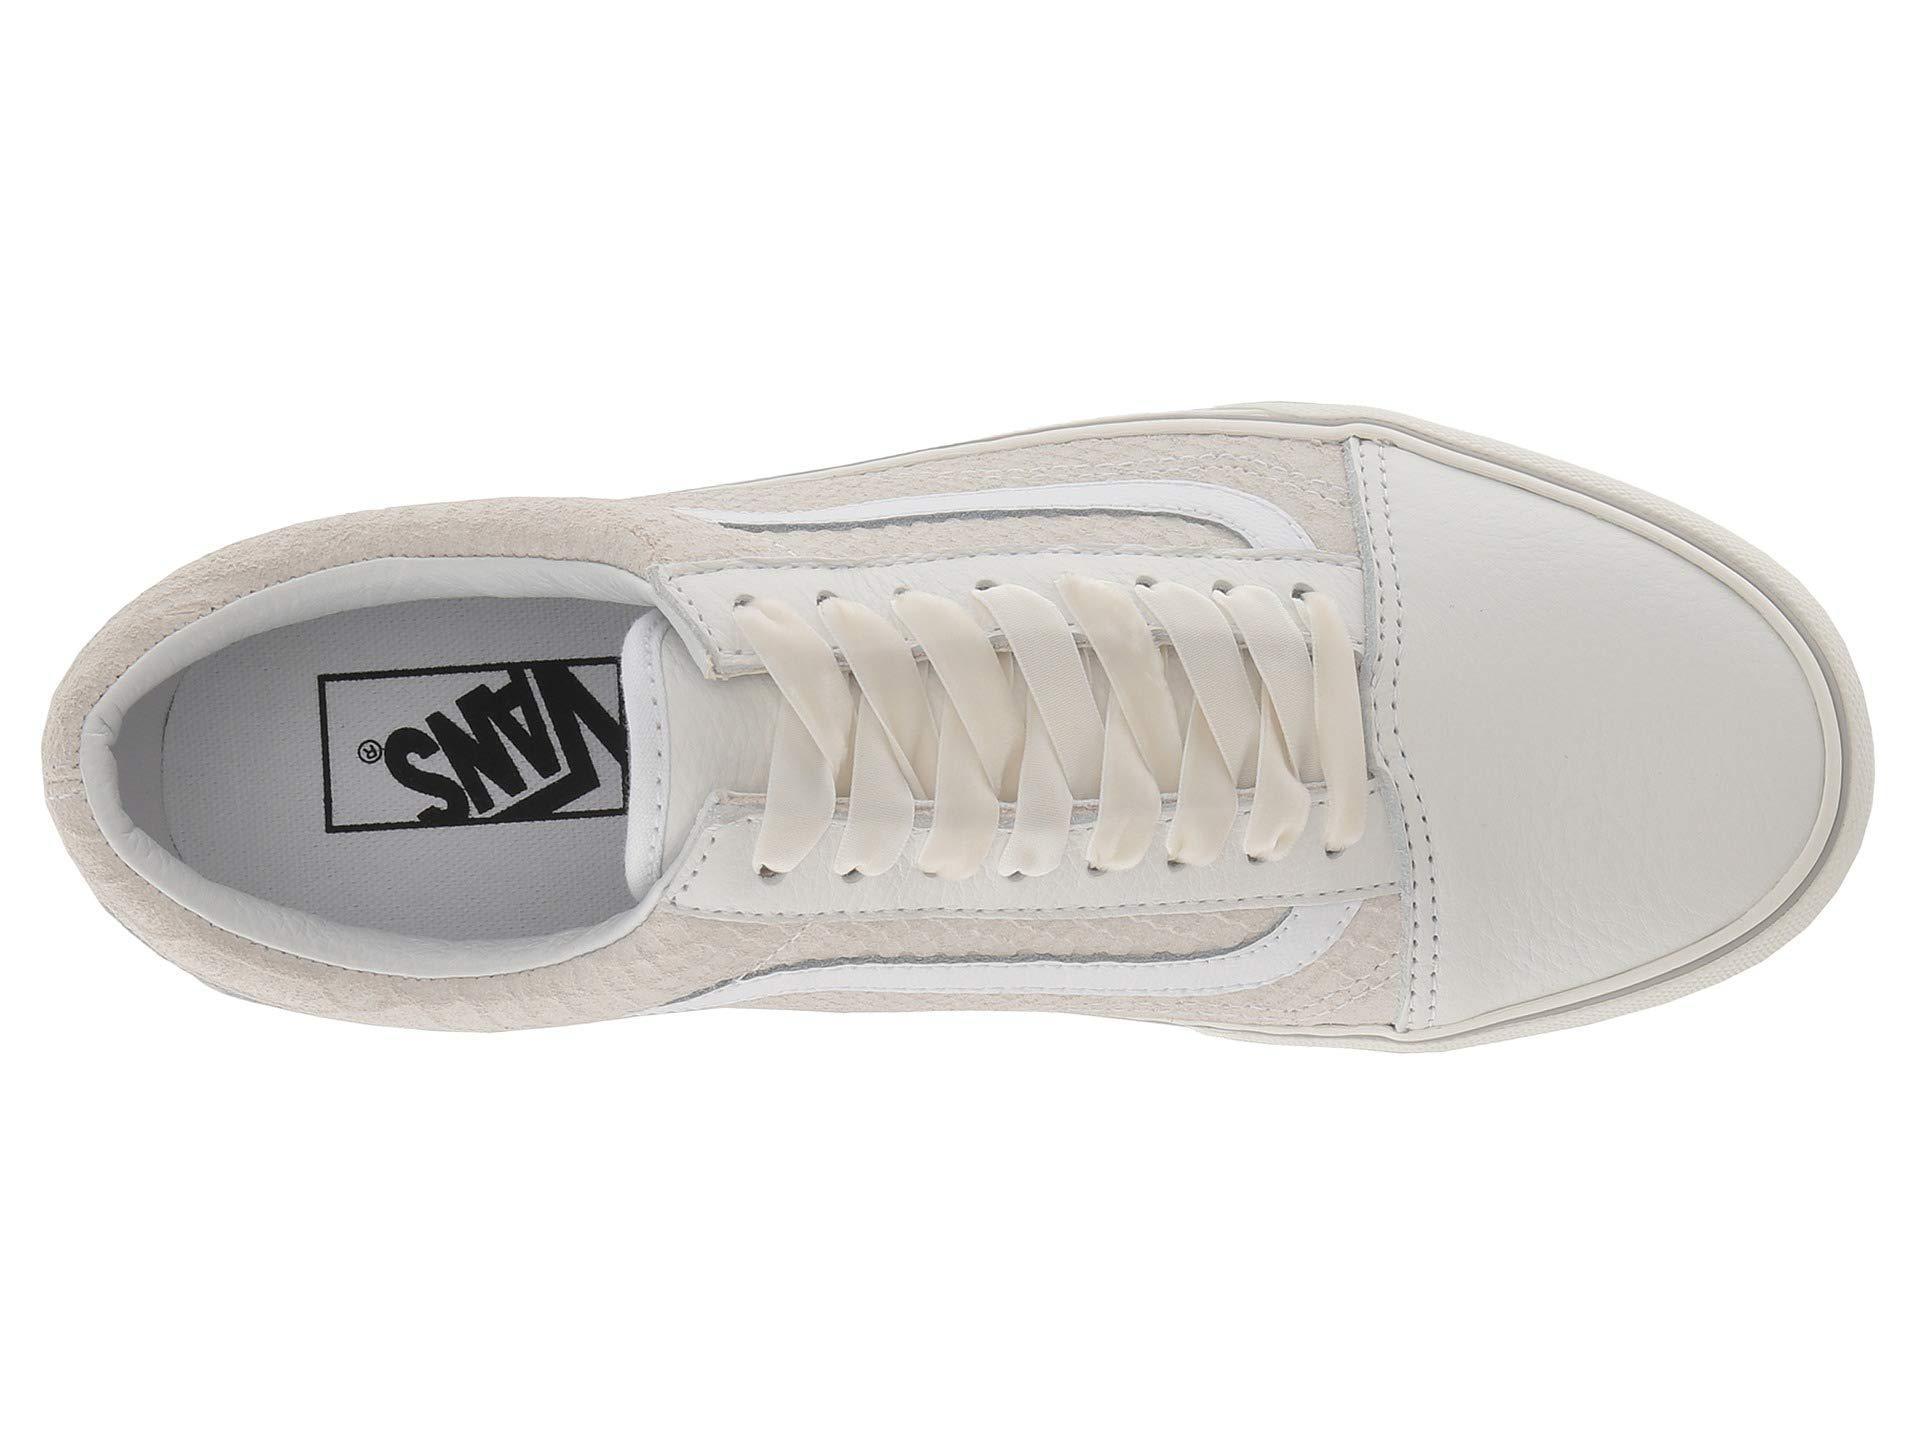 37d8fb1e4080 Lyst - Vans Old Skool Platform ((leather) Snake white) Skate Shoes ...